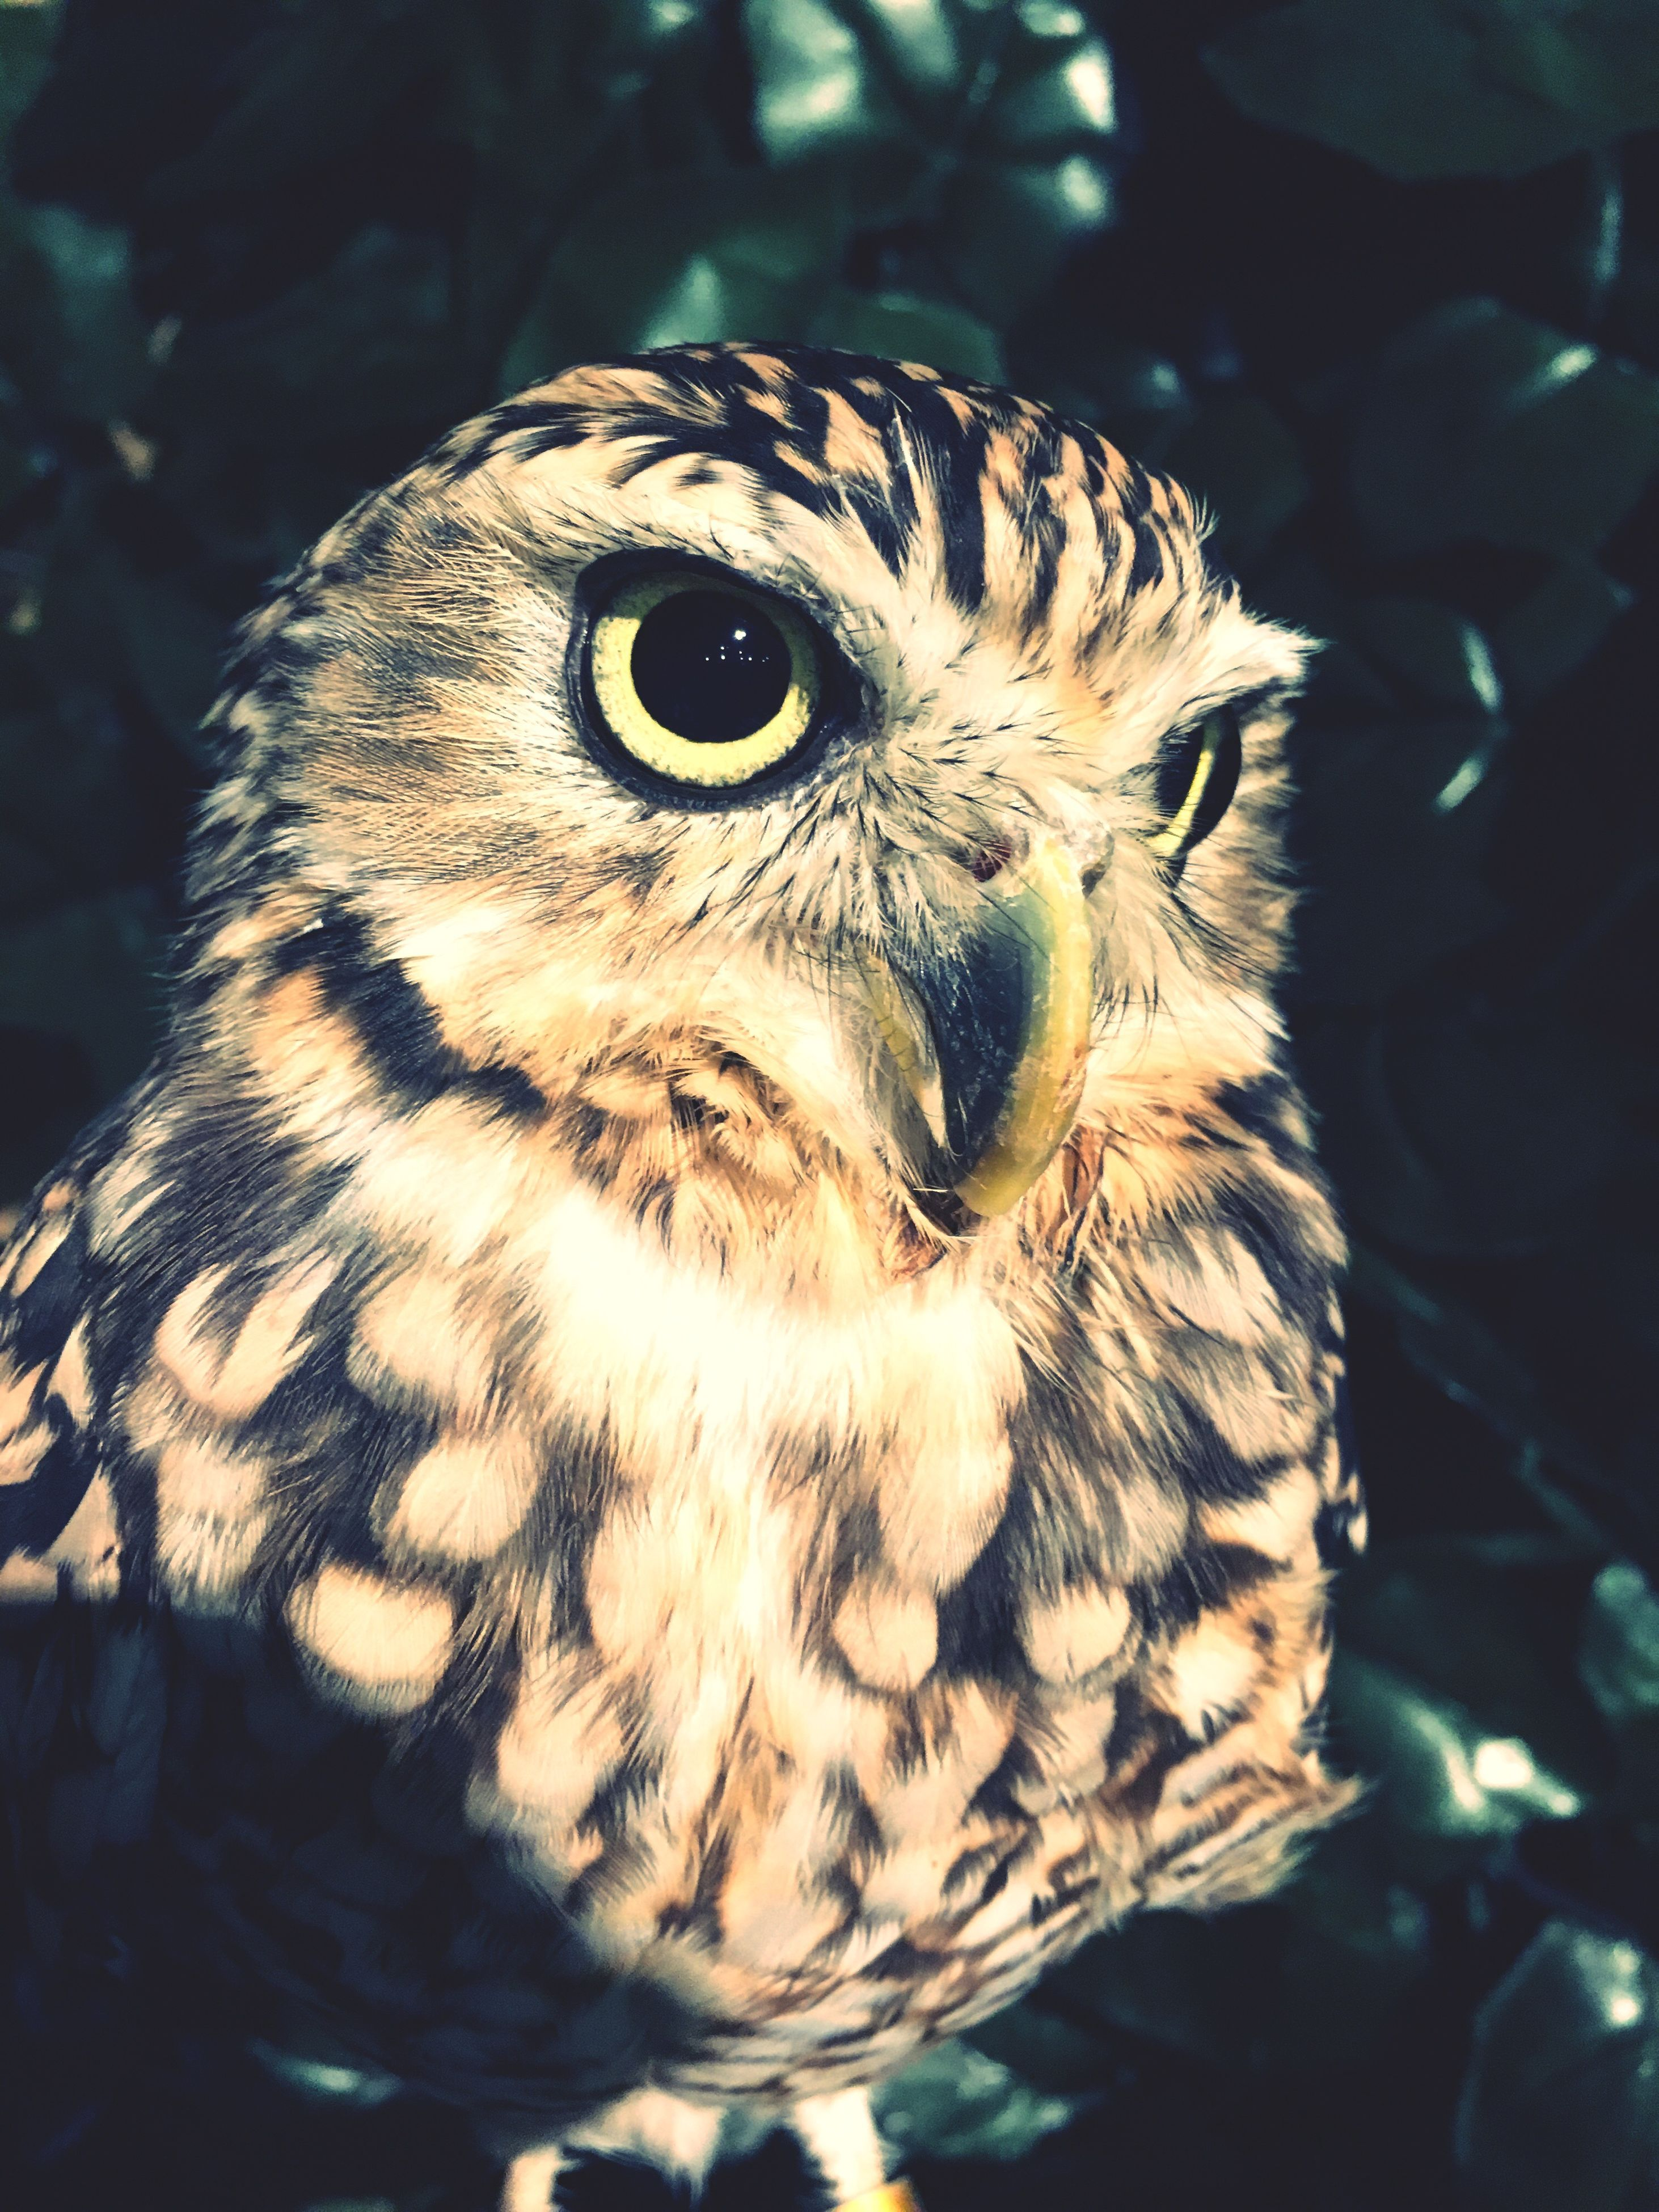 one animal, animal themes, bird, animals in the wild, close-up, animal wildlife, bird of prey, no people, owl, nature, hawk, day, indoors